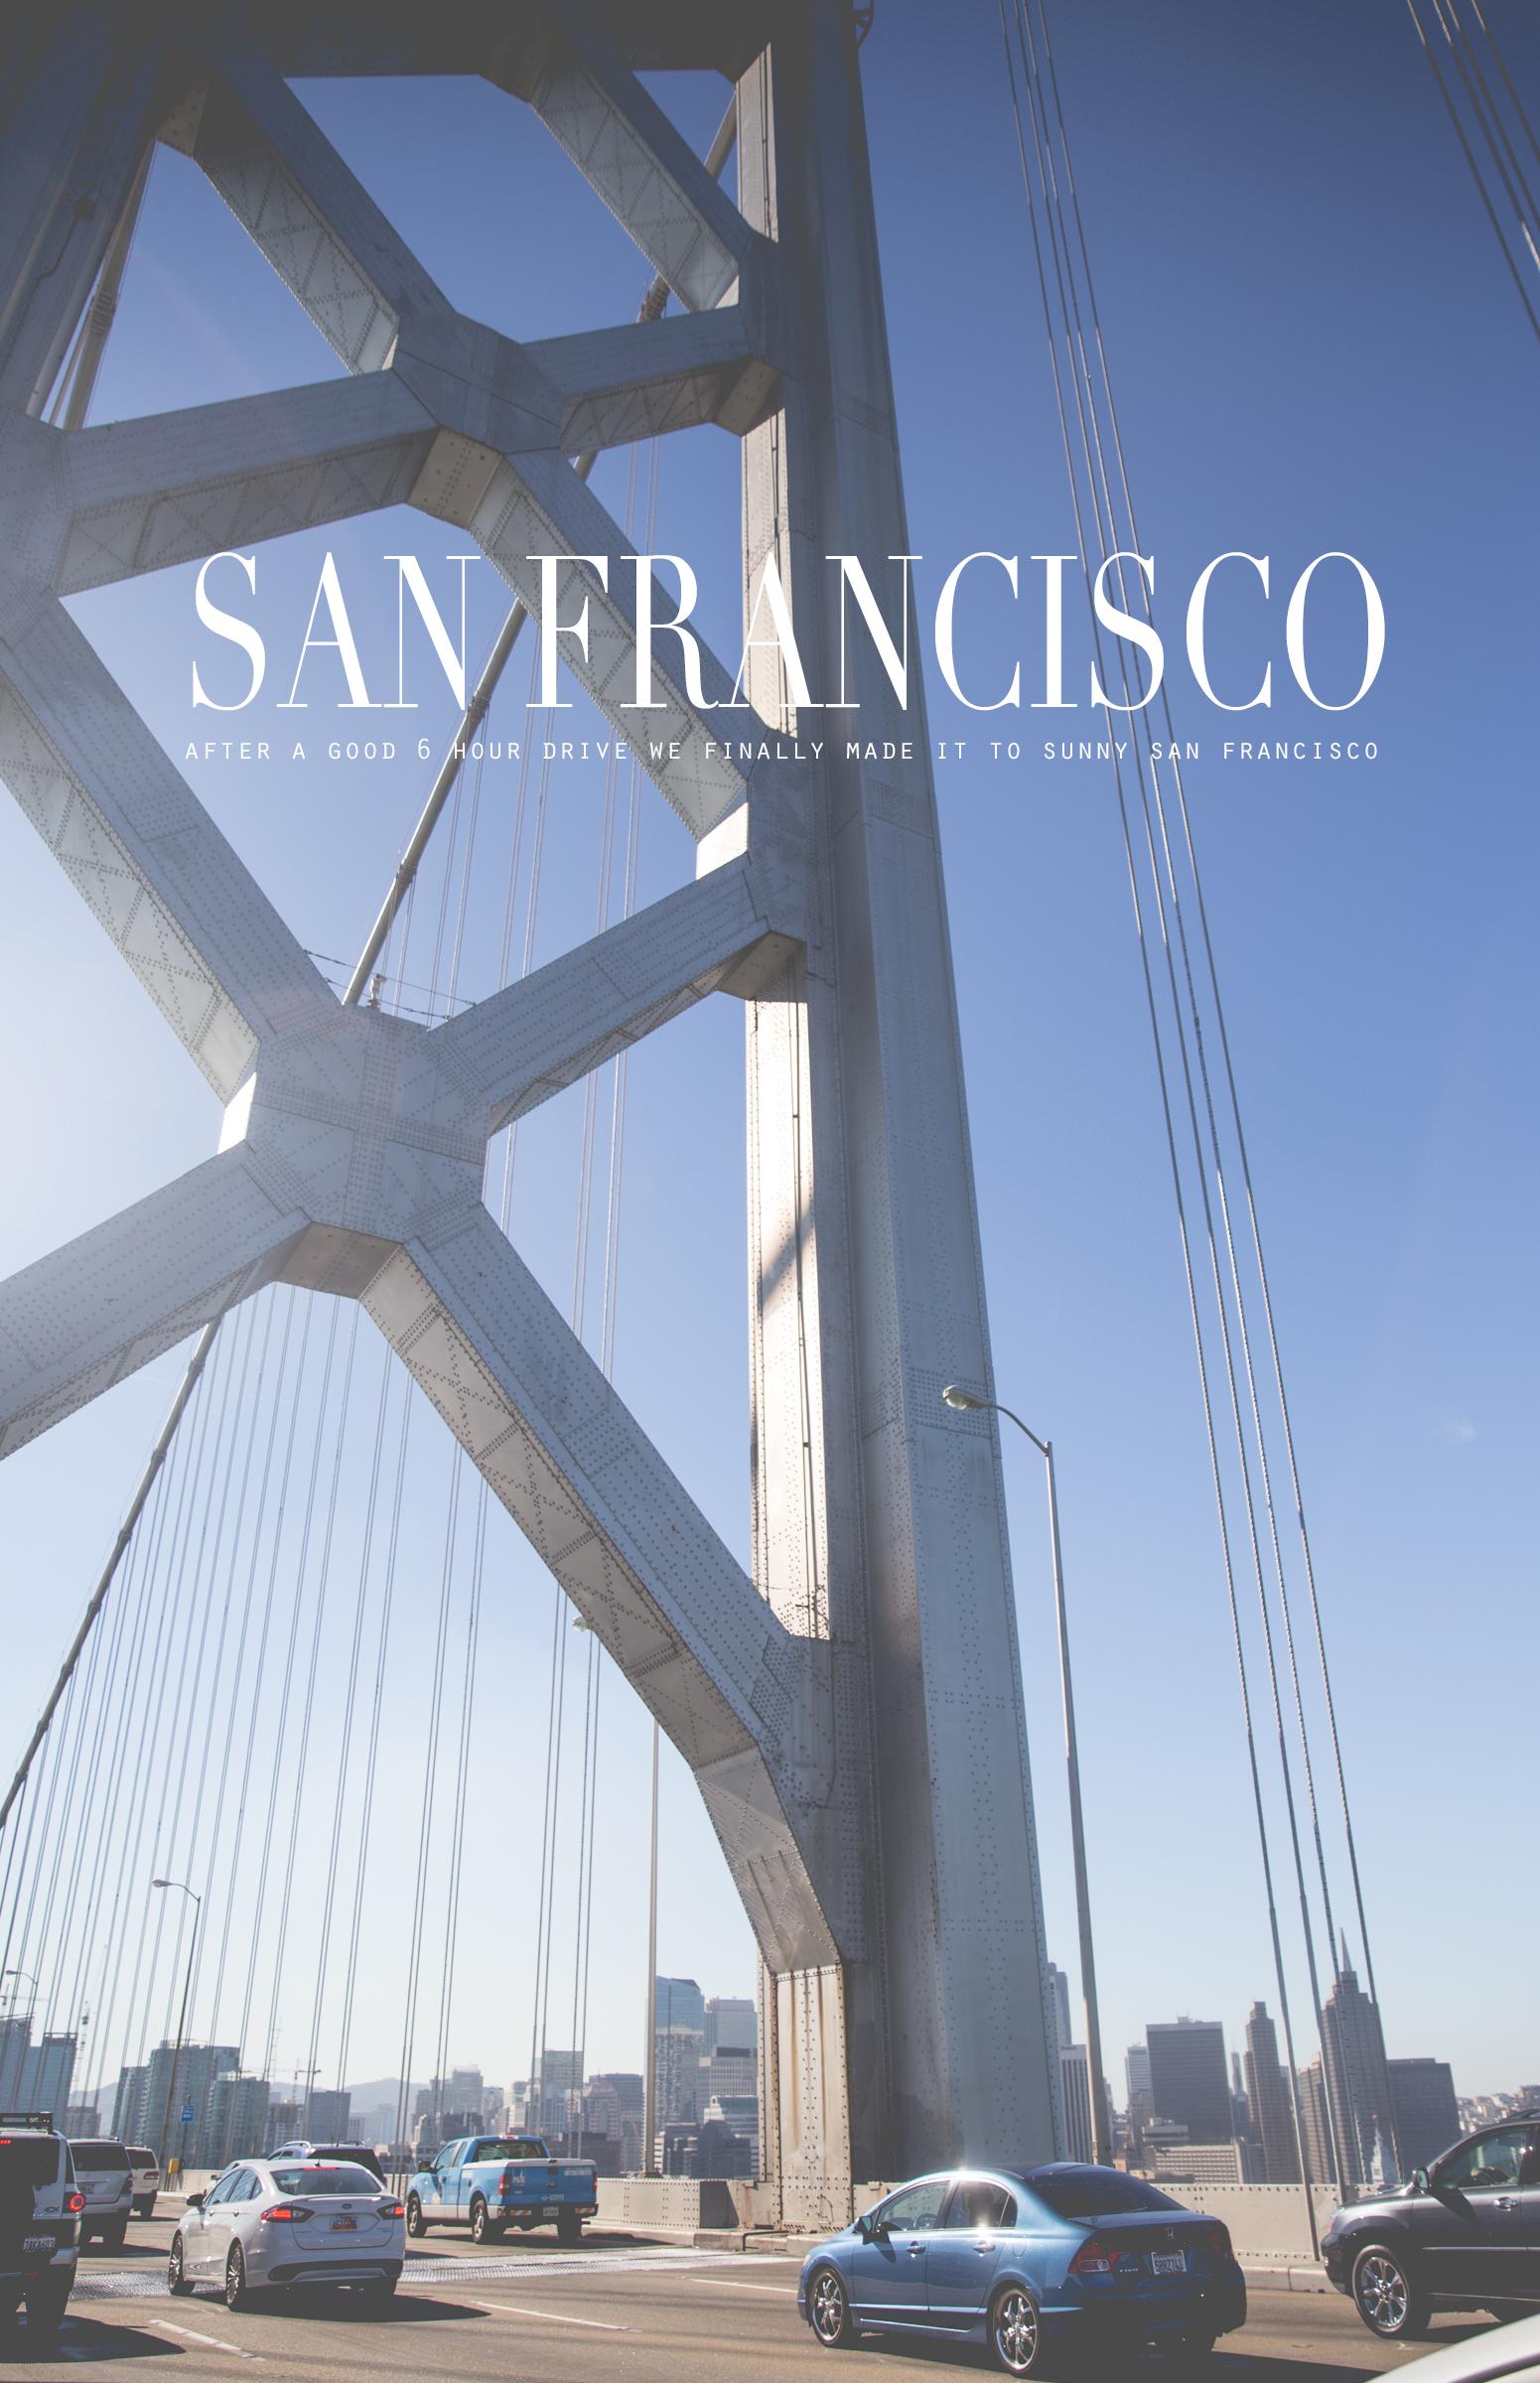 sanfrancisco-7969 copy